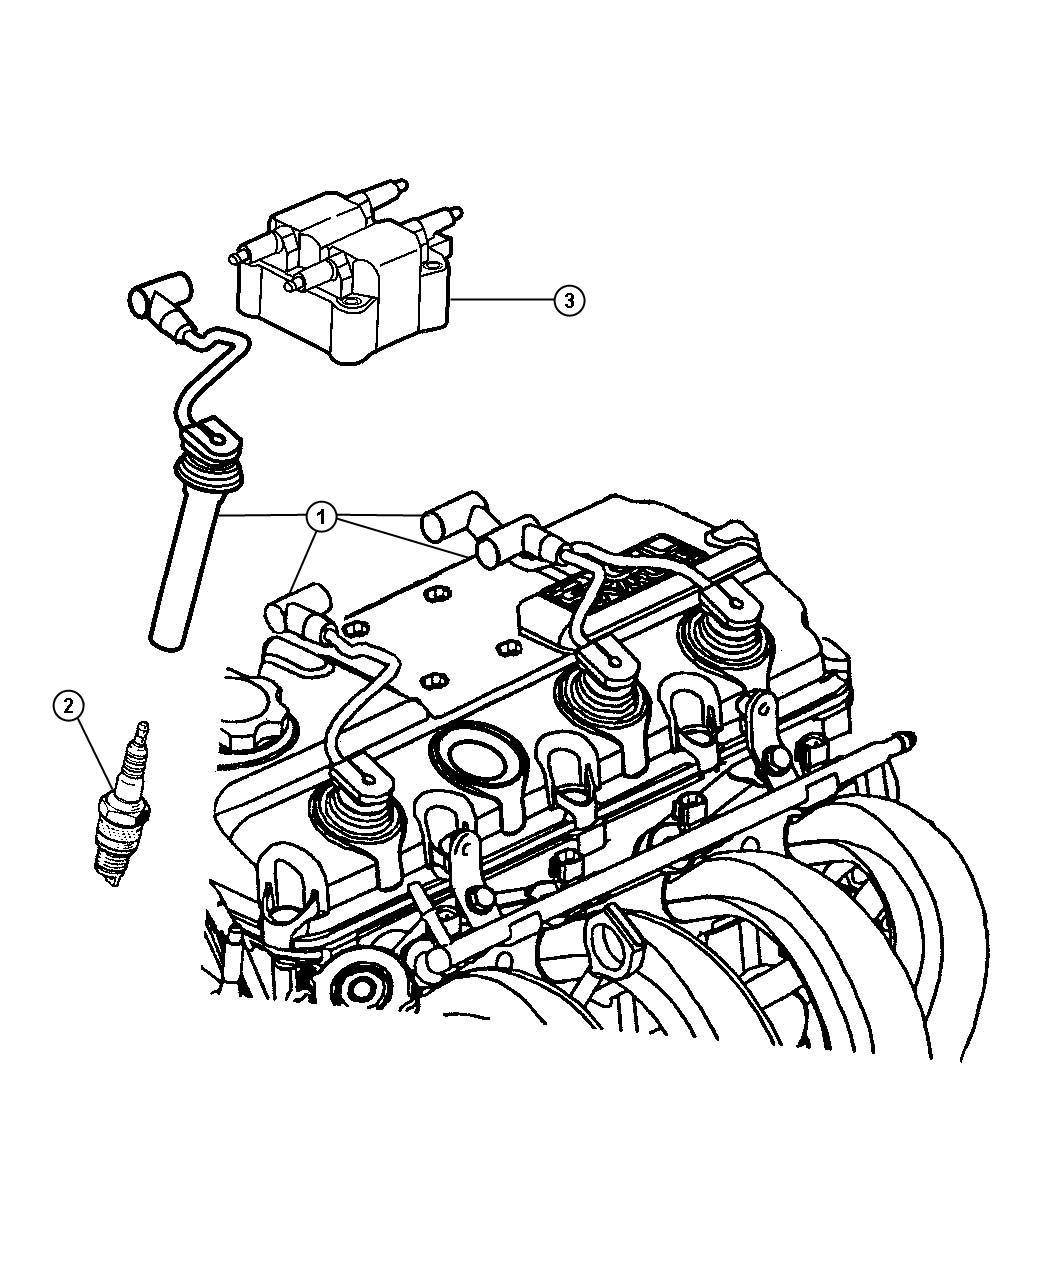 Jeep Liberty Spark Plug Re 14mc C5 Up To 11 27 03